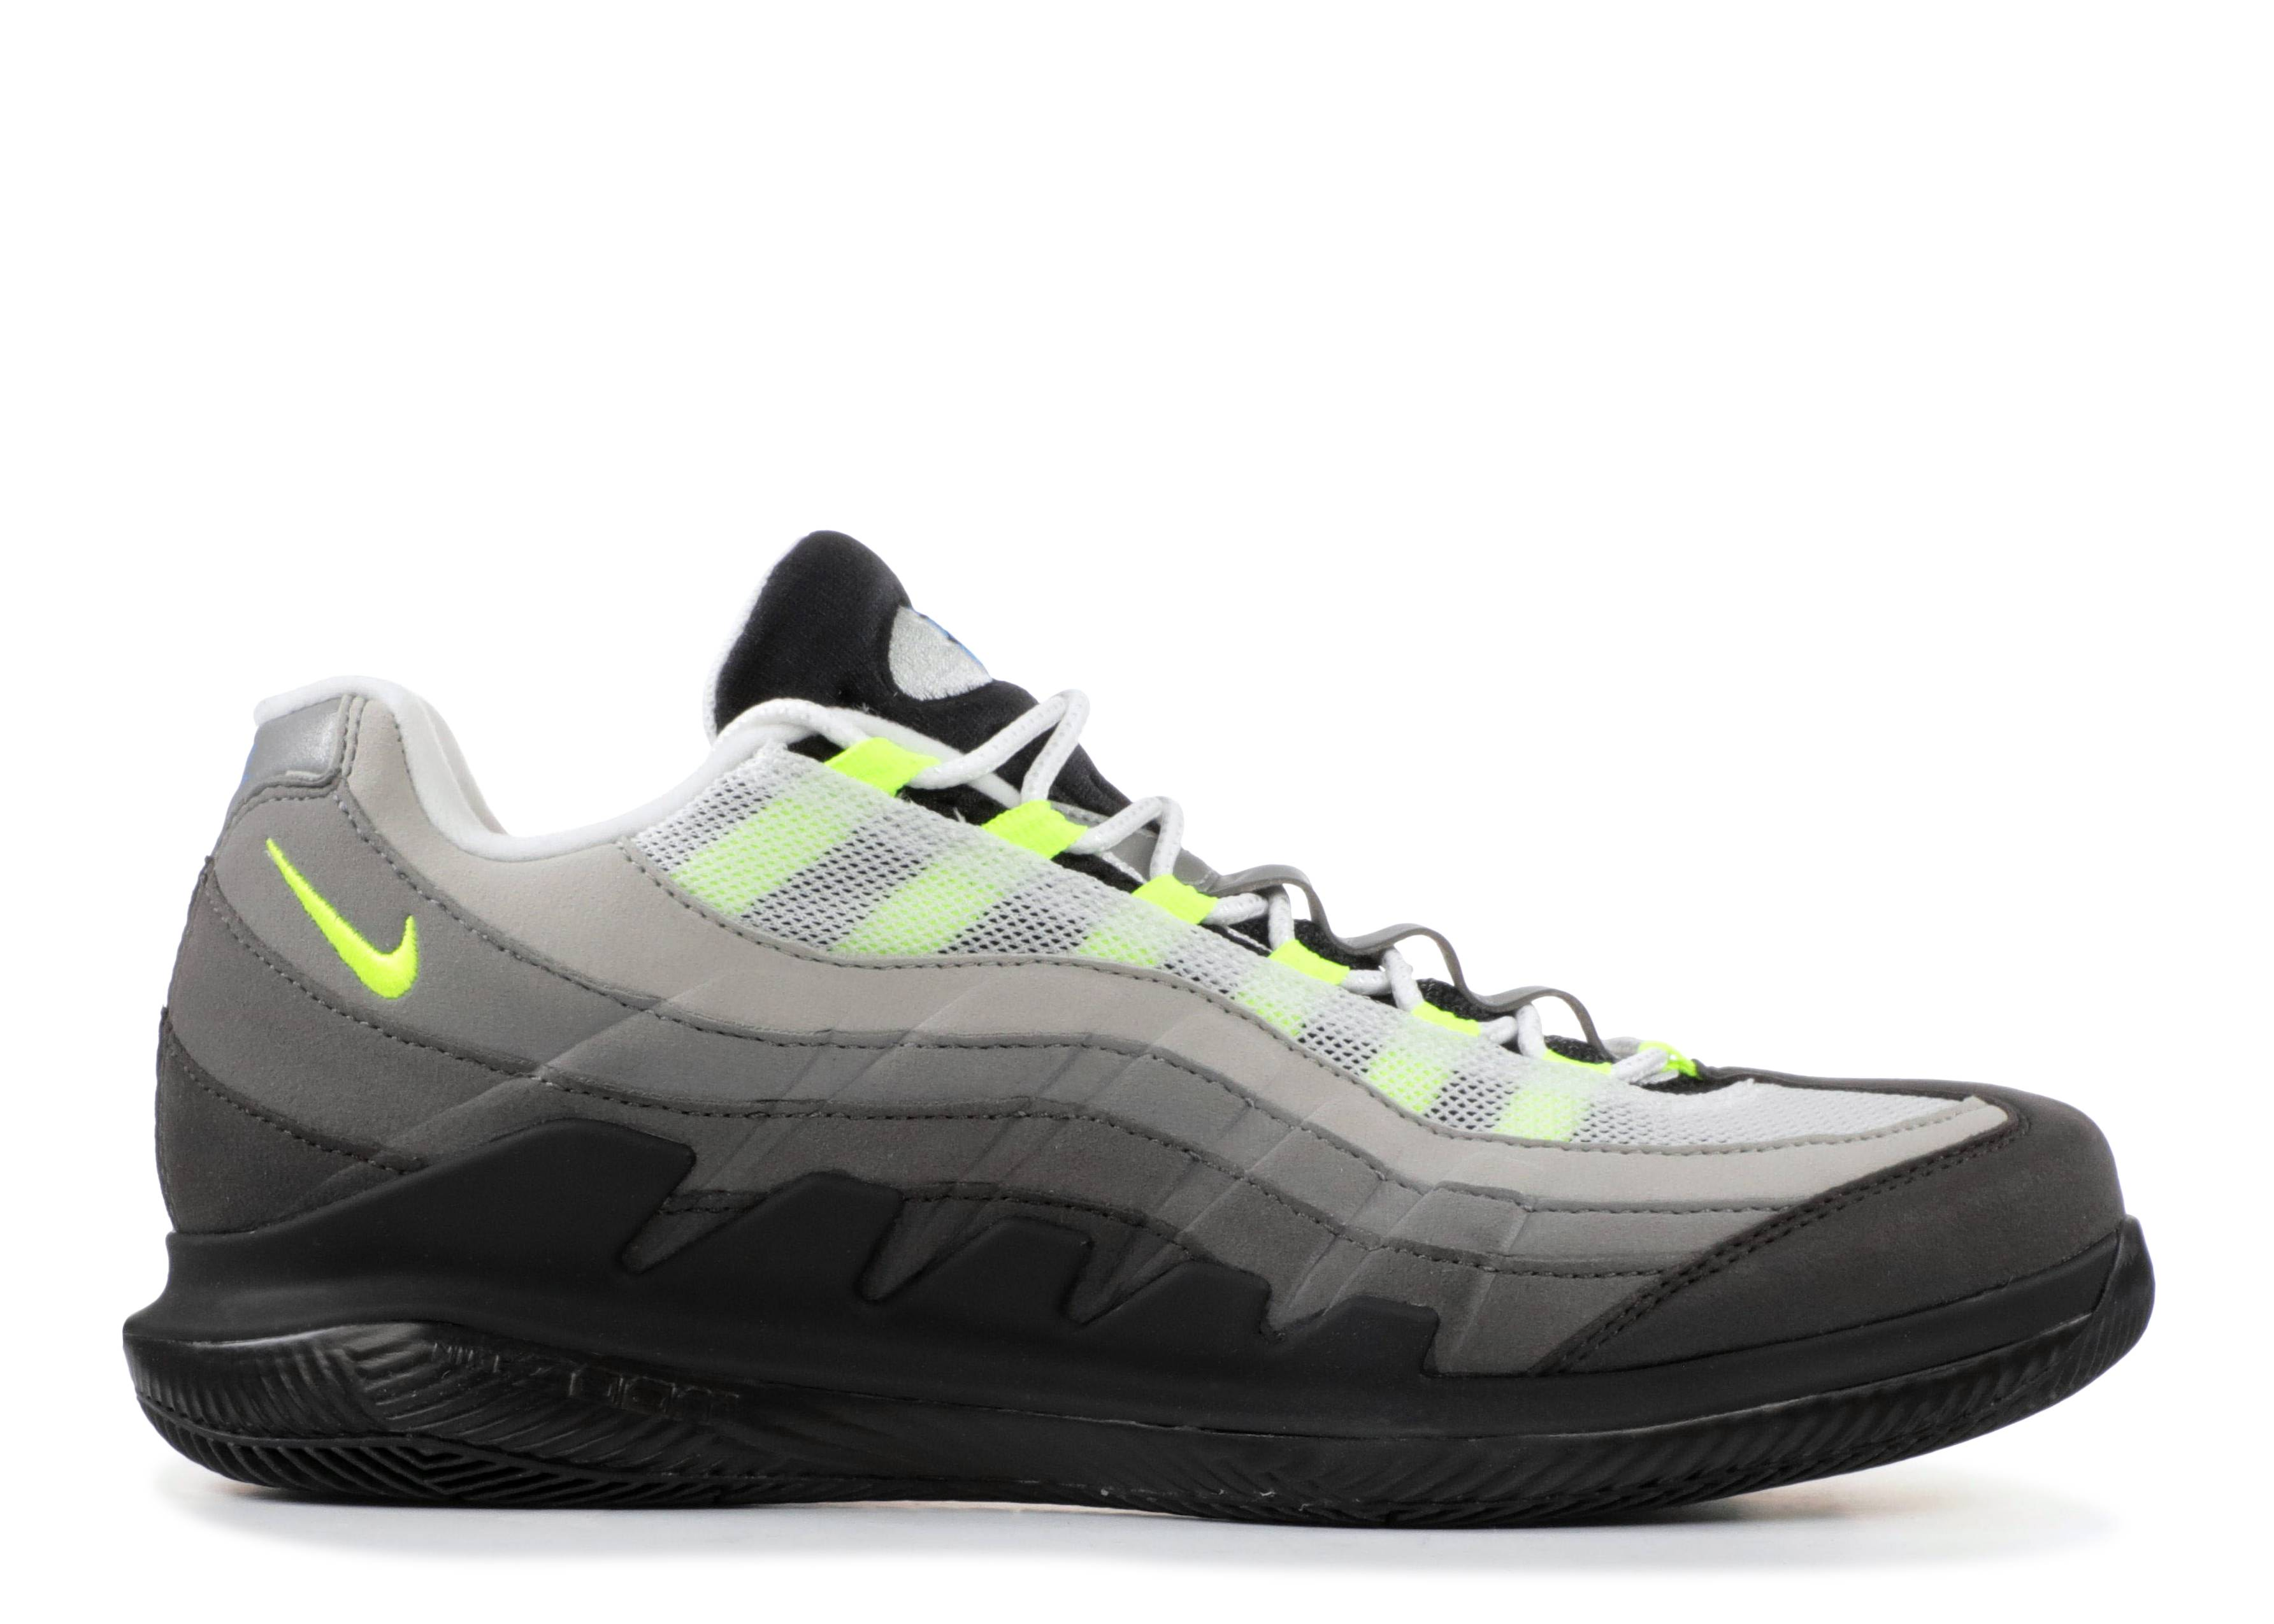 cheaper f84e3 5bcb0 Nike Zoom Vapor RF x AM 95